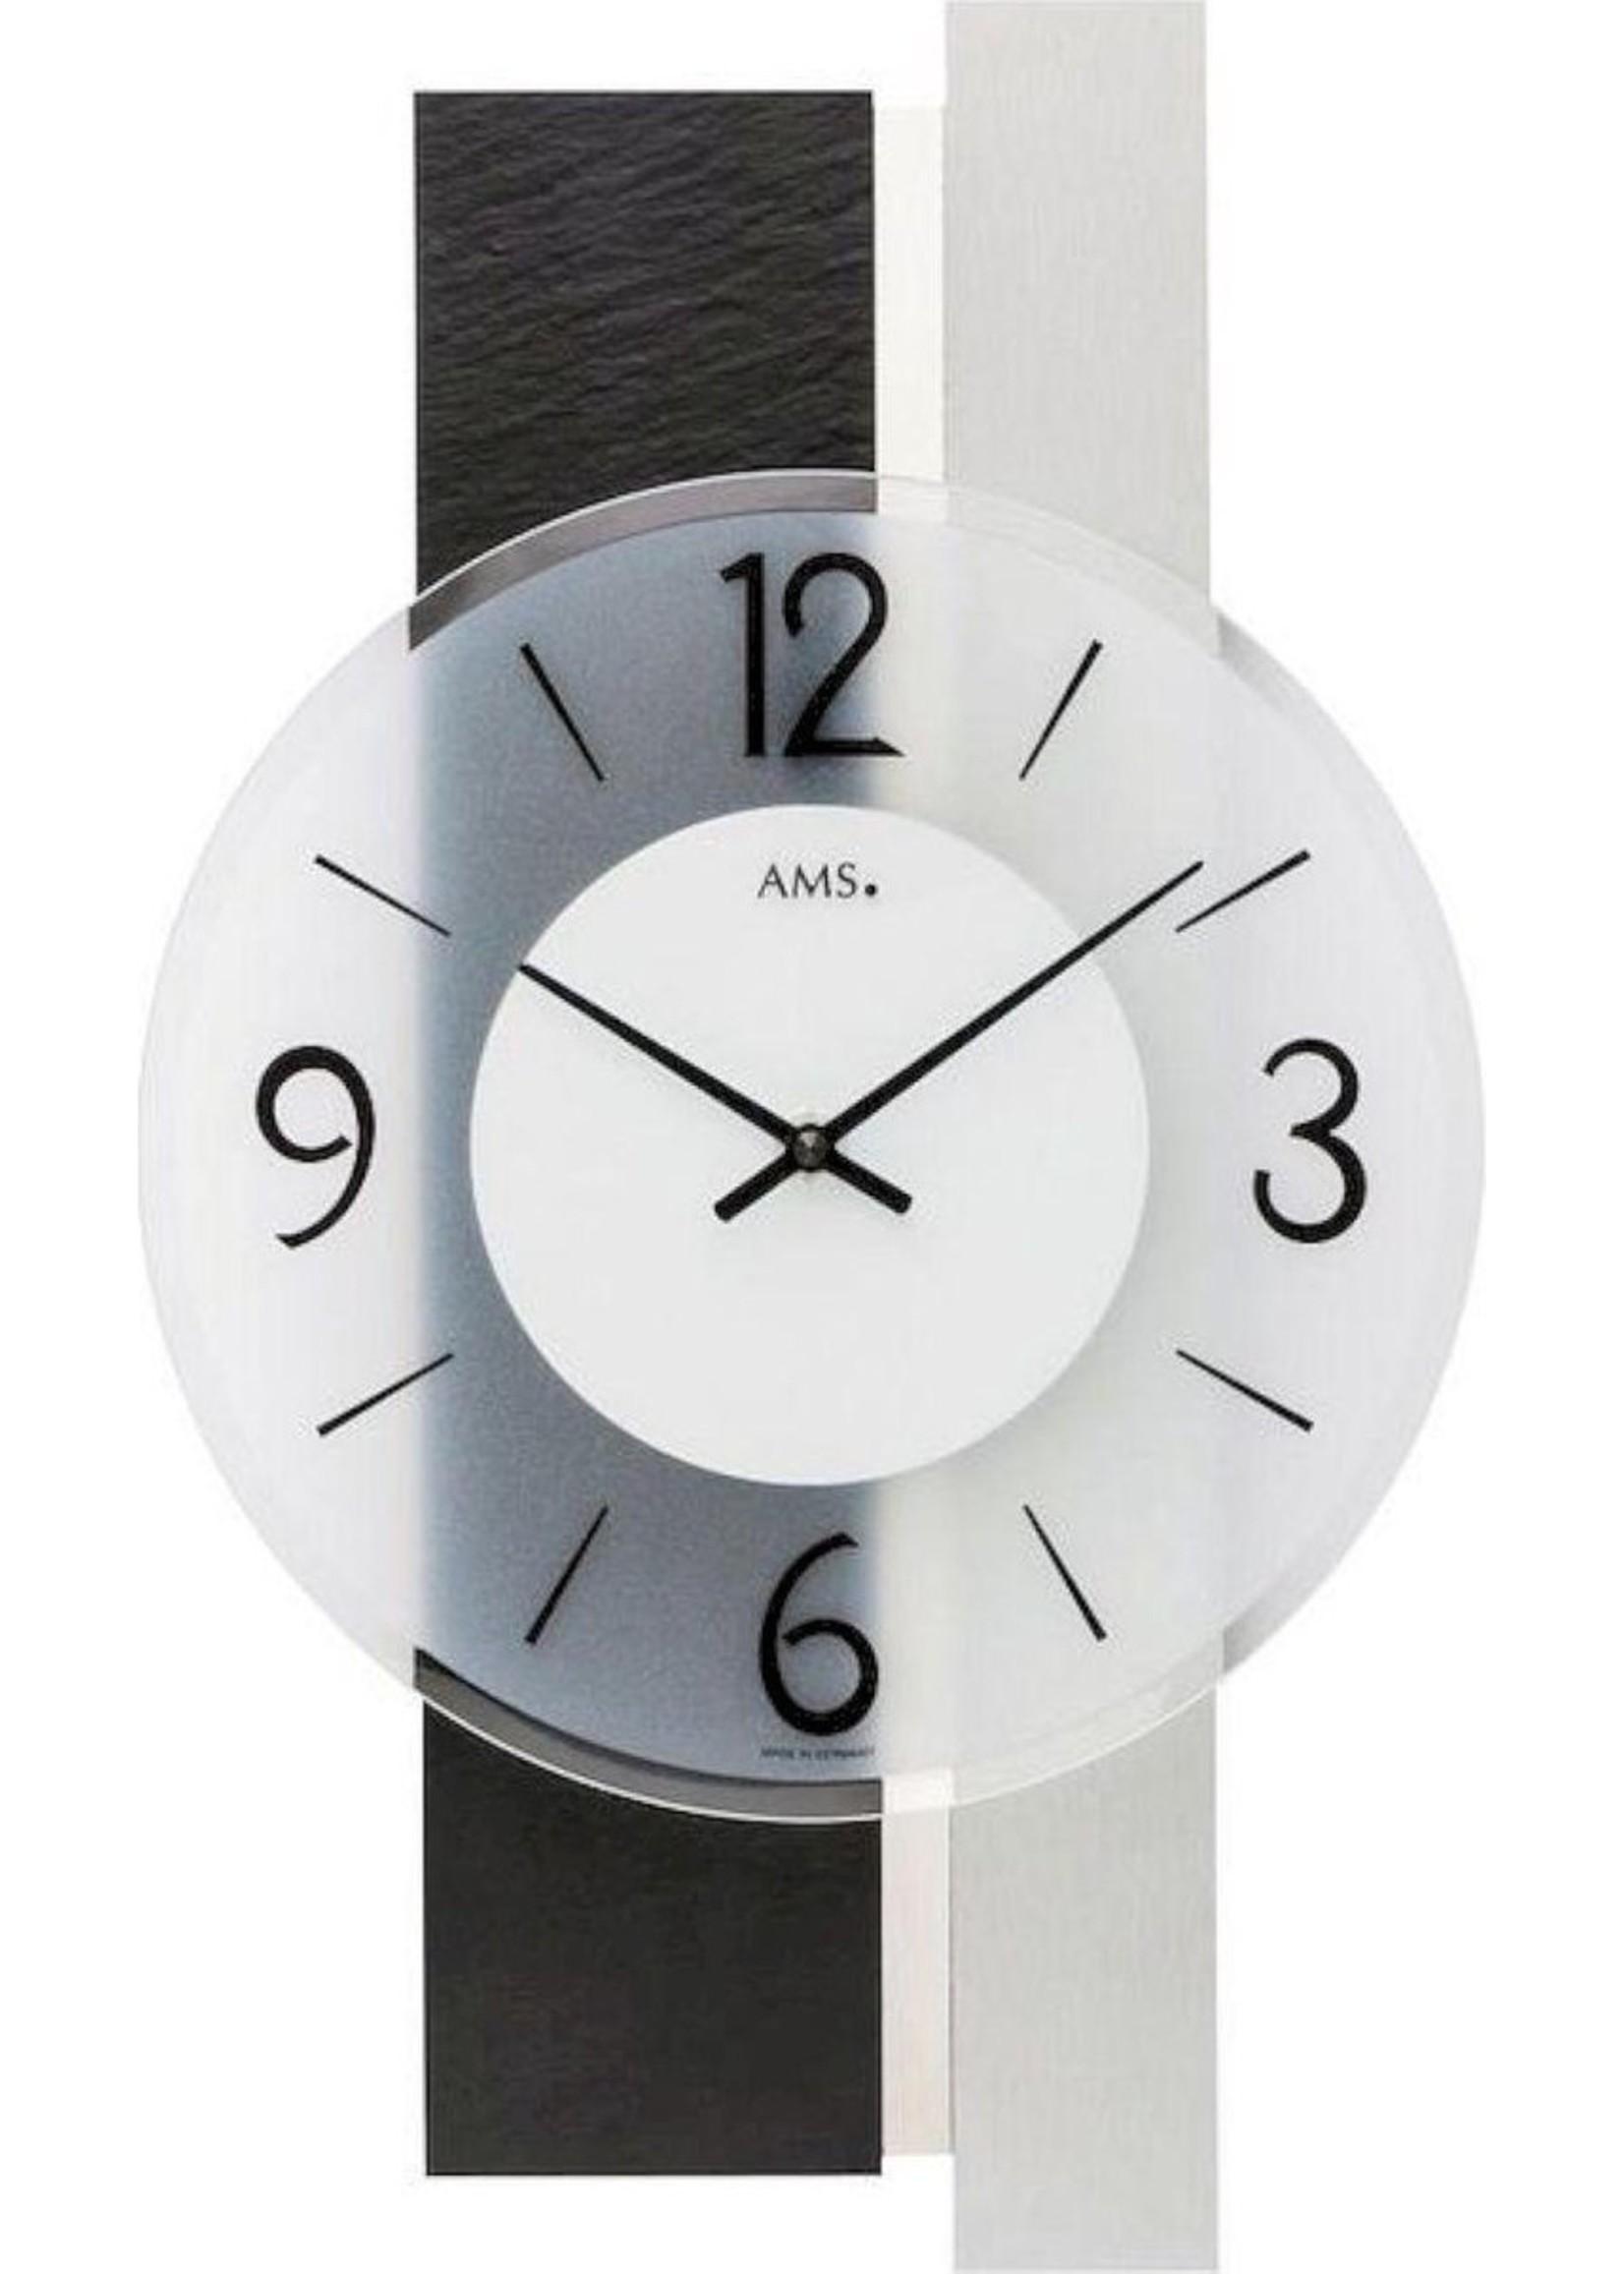 AMS AMS SAINT TROPEZ Modern Design